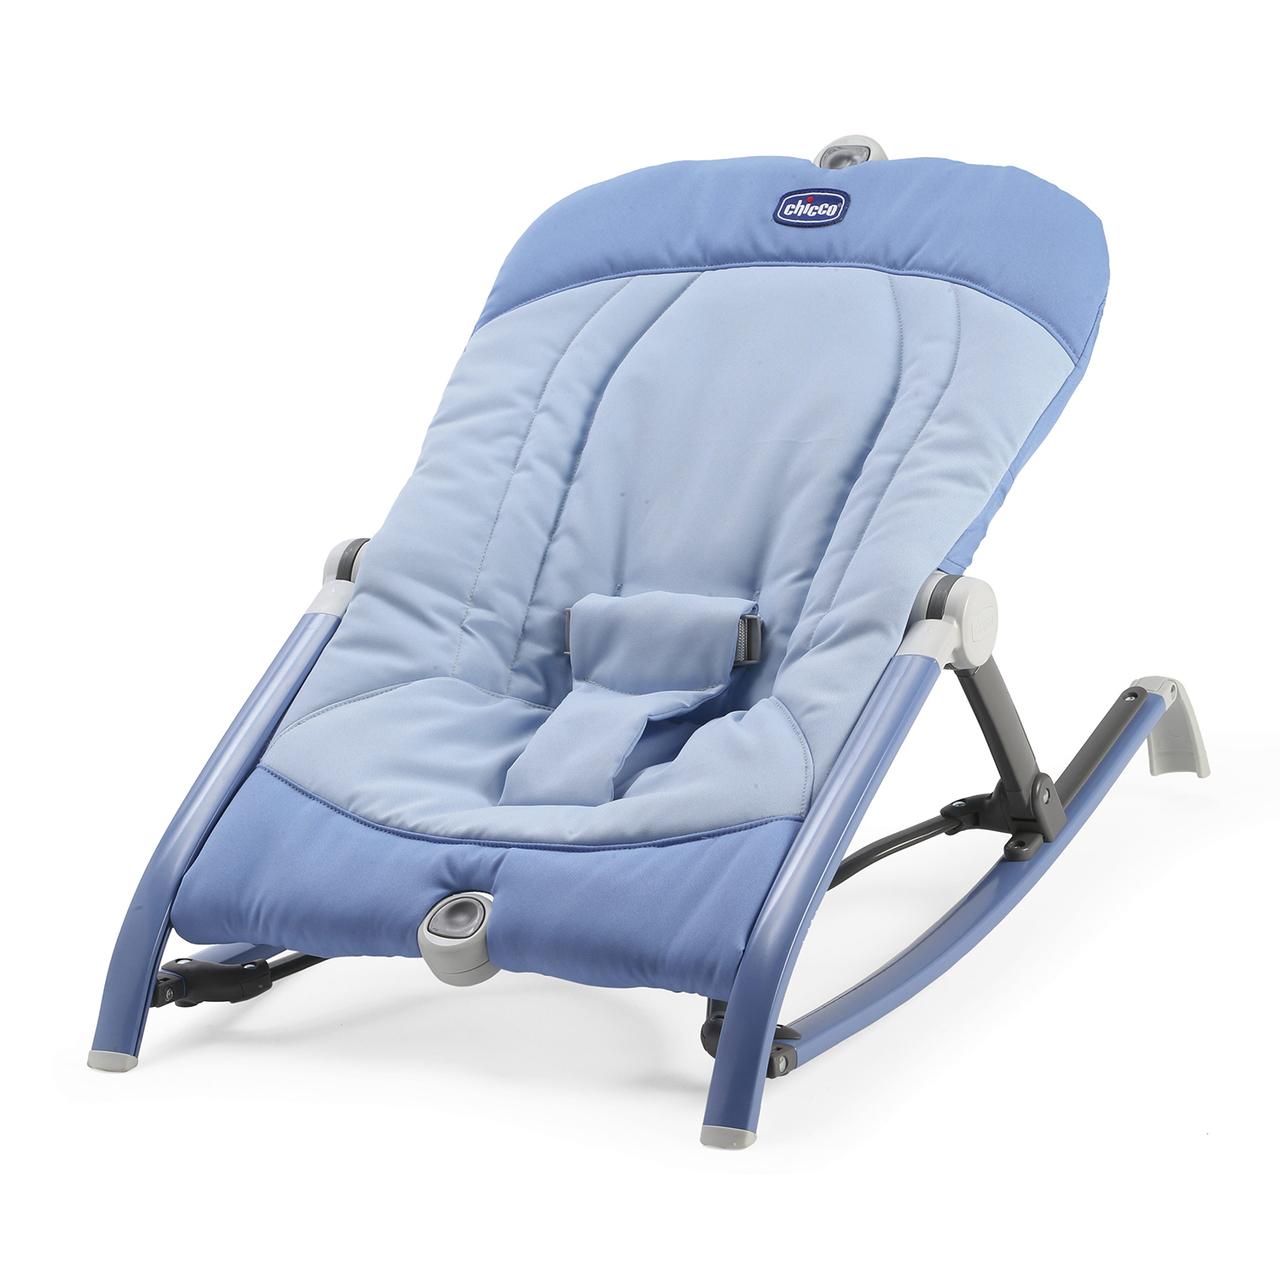 Balansoar pliabil pentru bebelusi Chicco Pocket Relax, Indigo, 0+luni